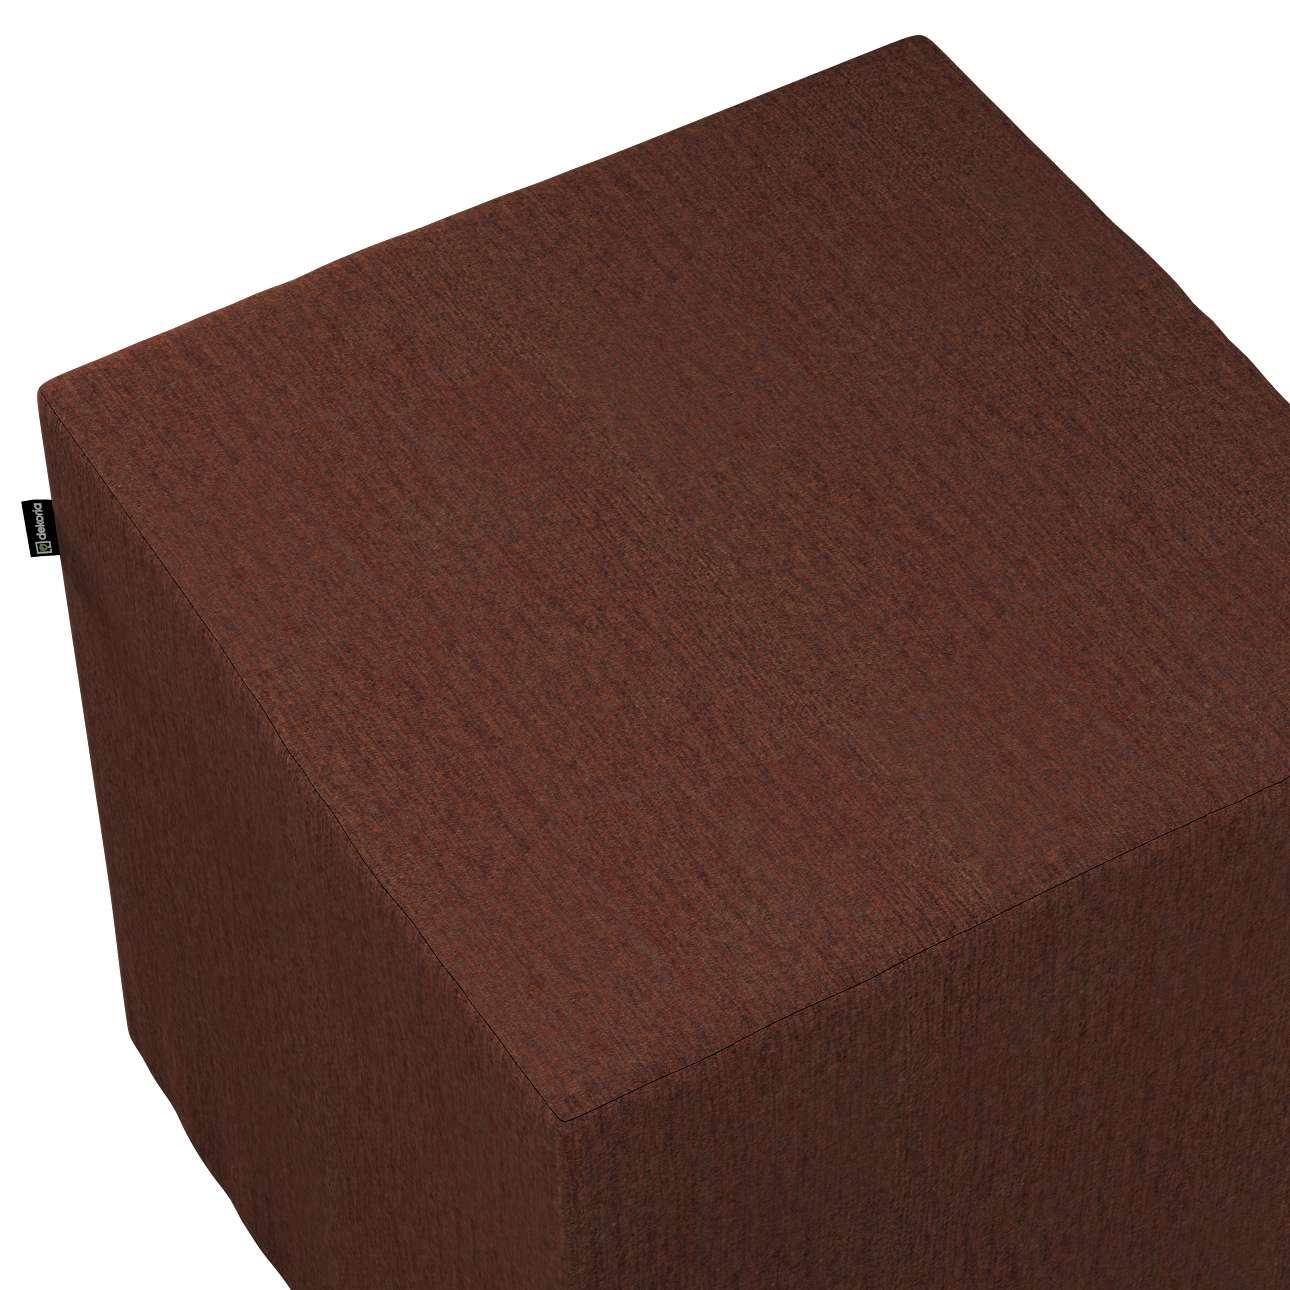 Pufa kostka w kolekcji Chenille, tkanina: 702-18